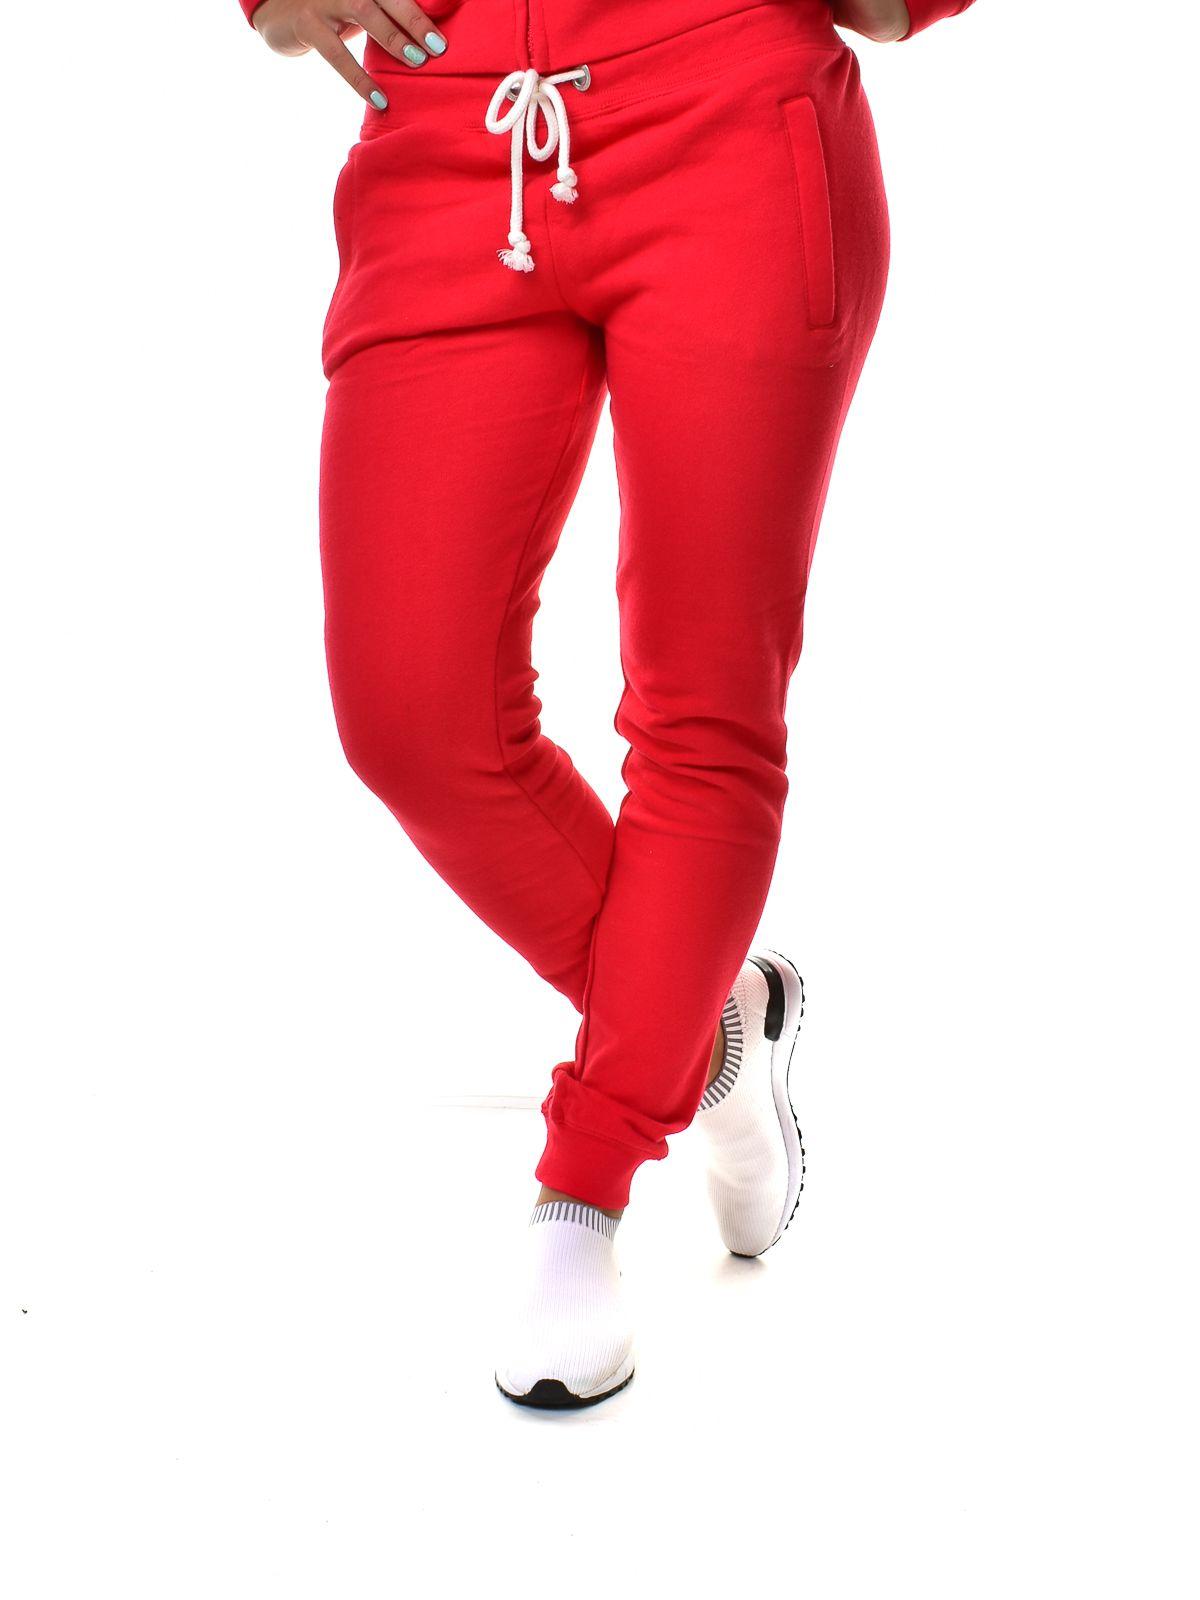 cc0250c37f Retro Jeans női jogging alsó ADRIANA PANTS JOGGING BOTTOM ...